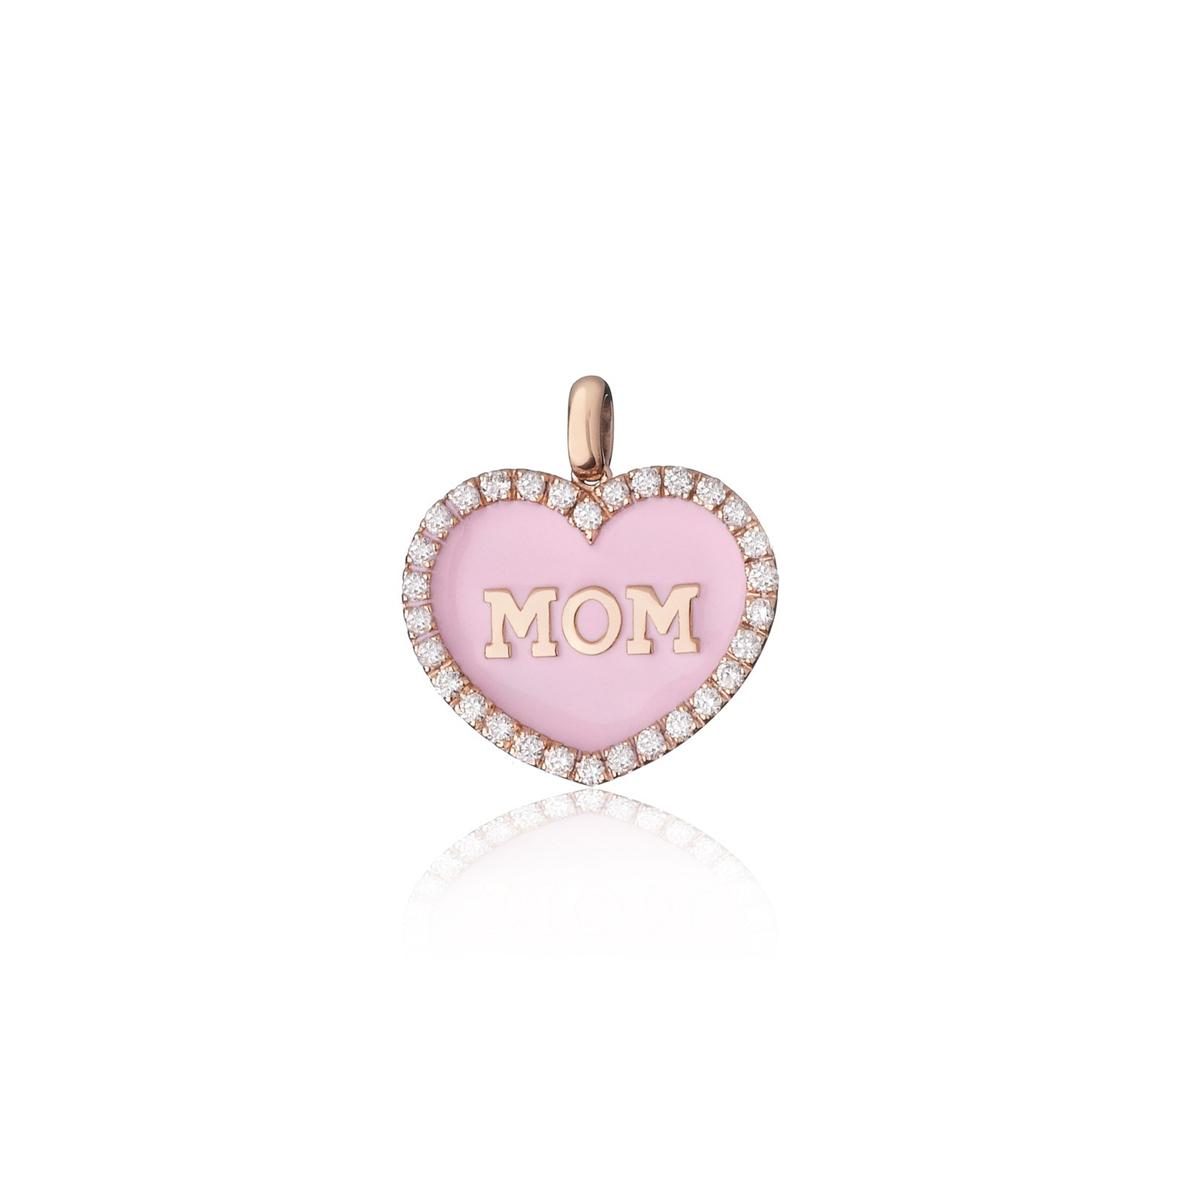 Mom Pendant